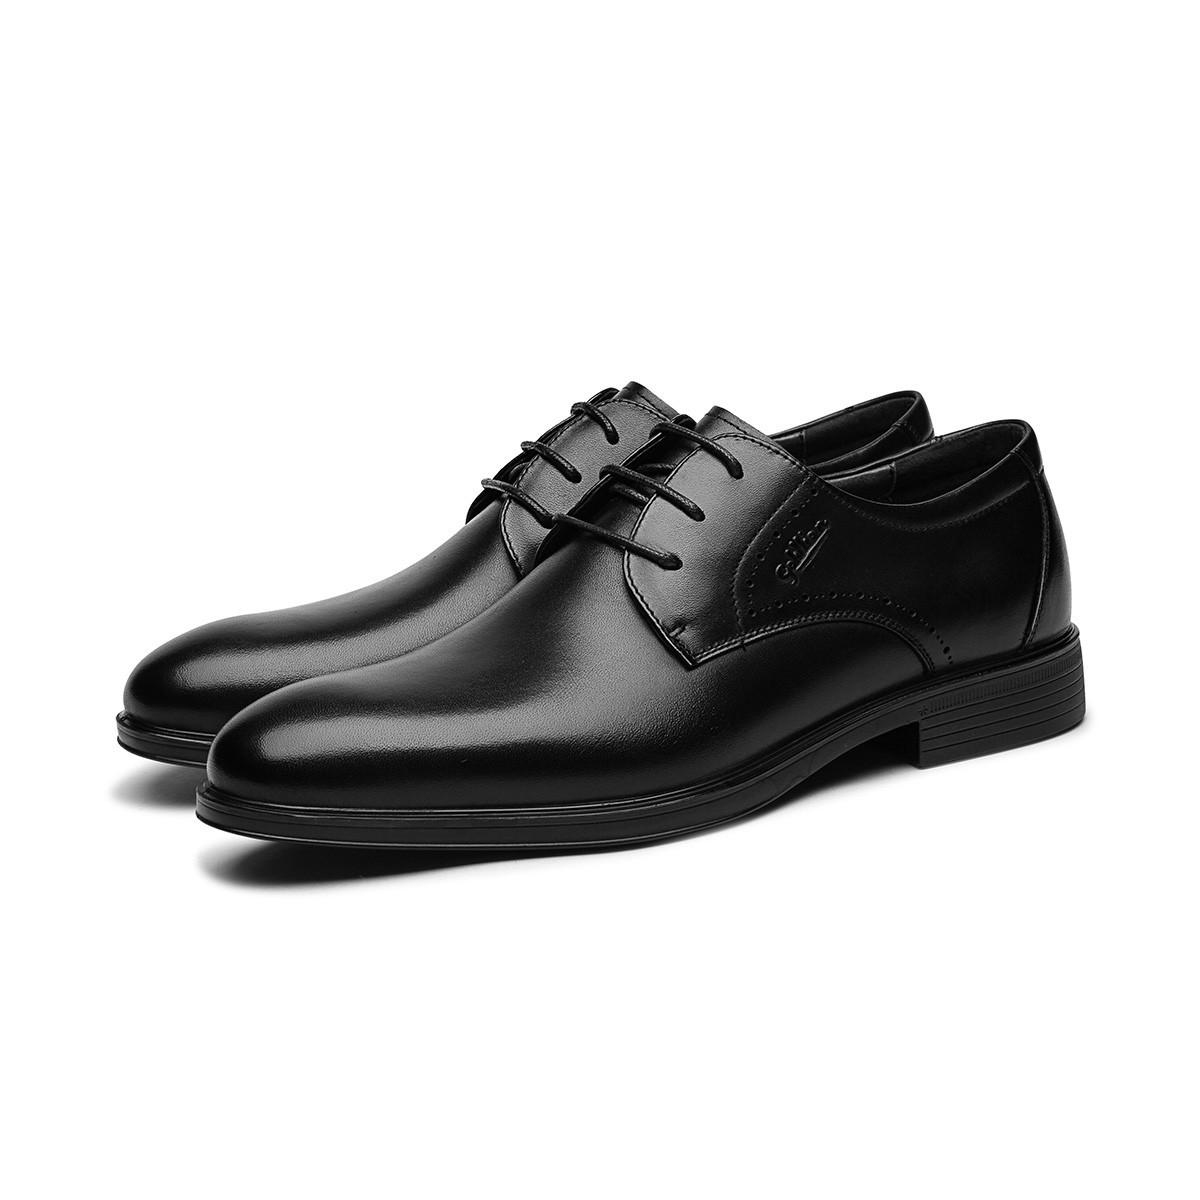 Goldlion 金利来 596830706AAA 男士商务正装皮鞋